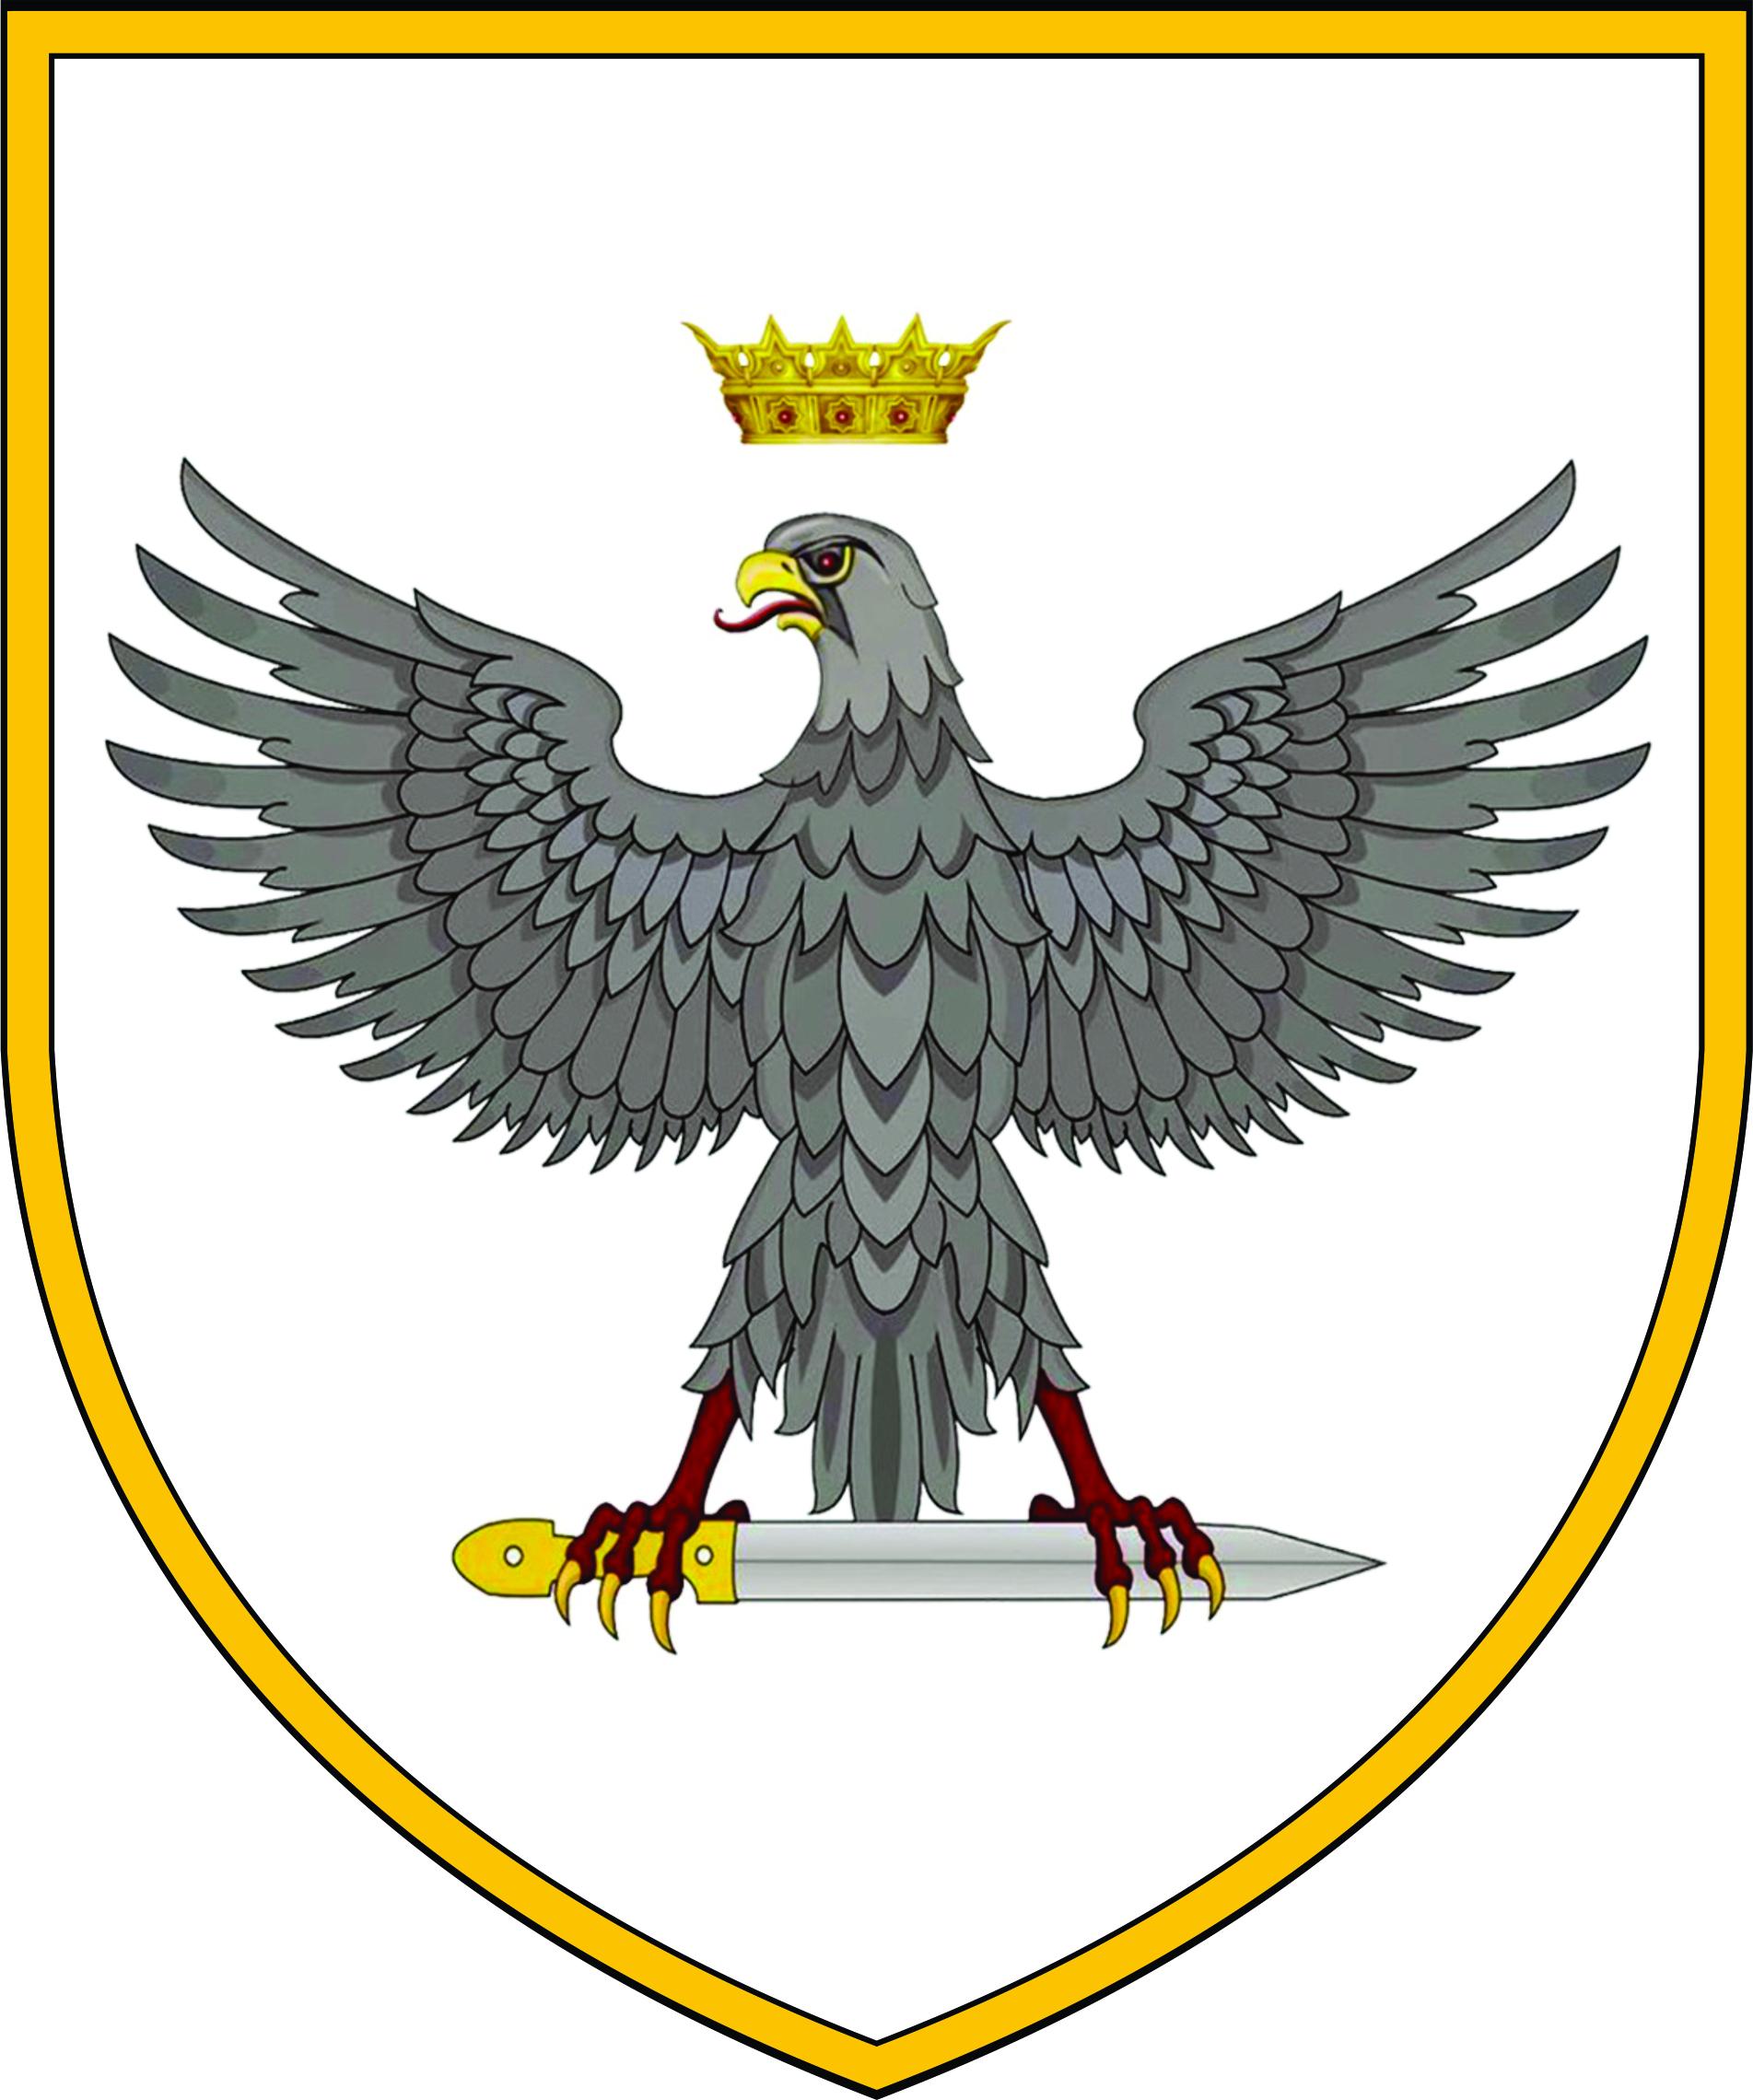 Meliq_Union_-_Coat_of_Arms.jpg